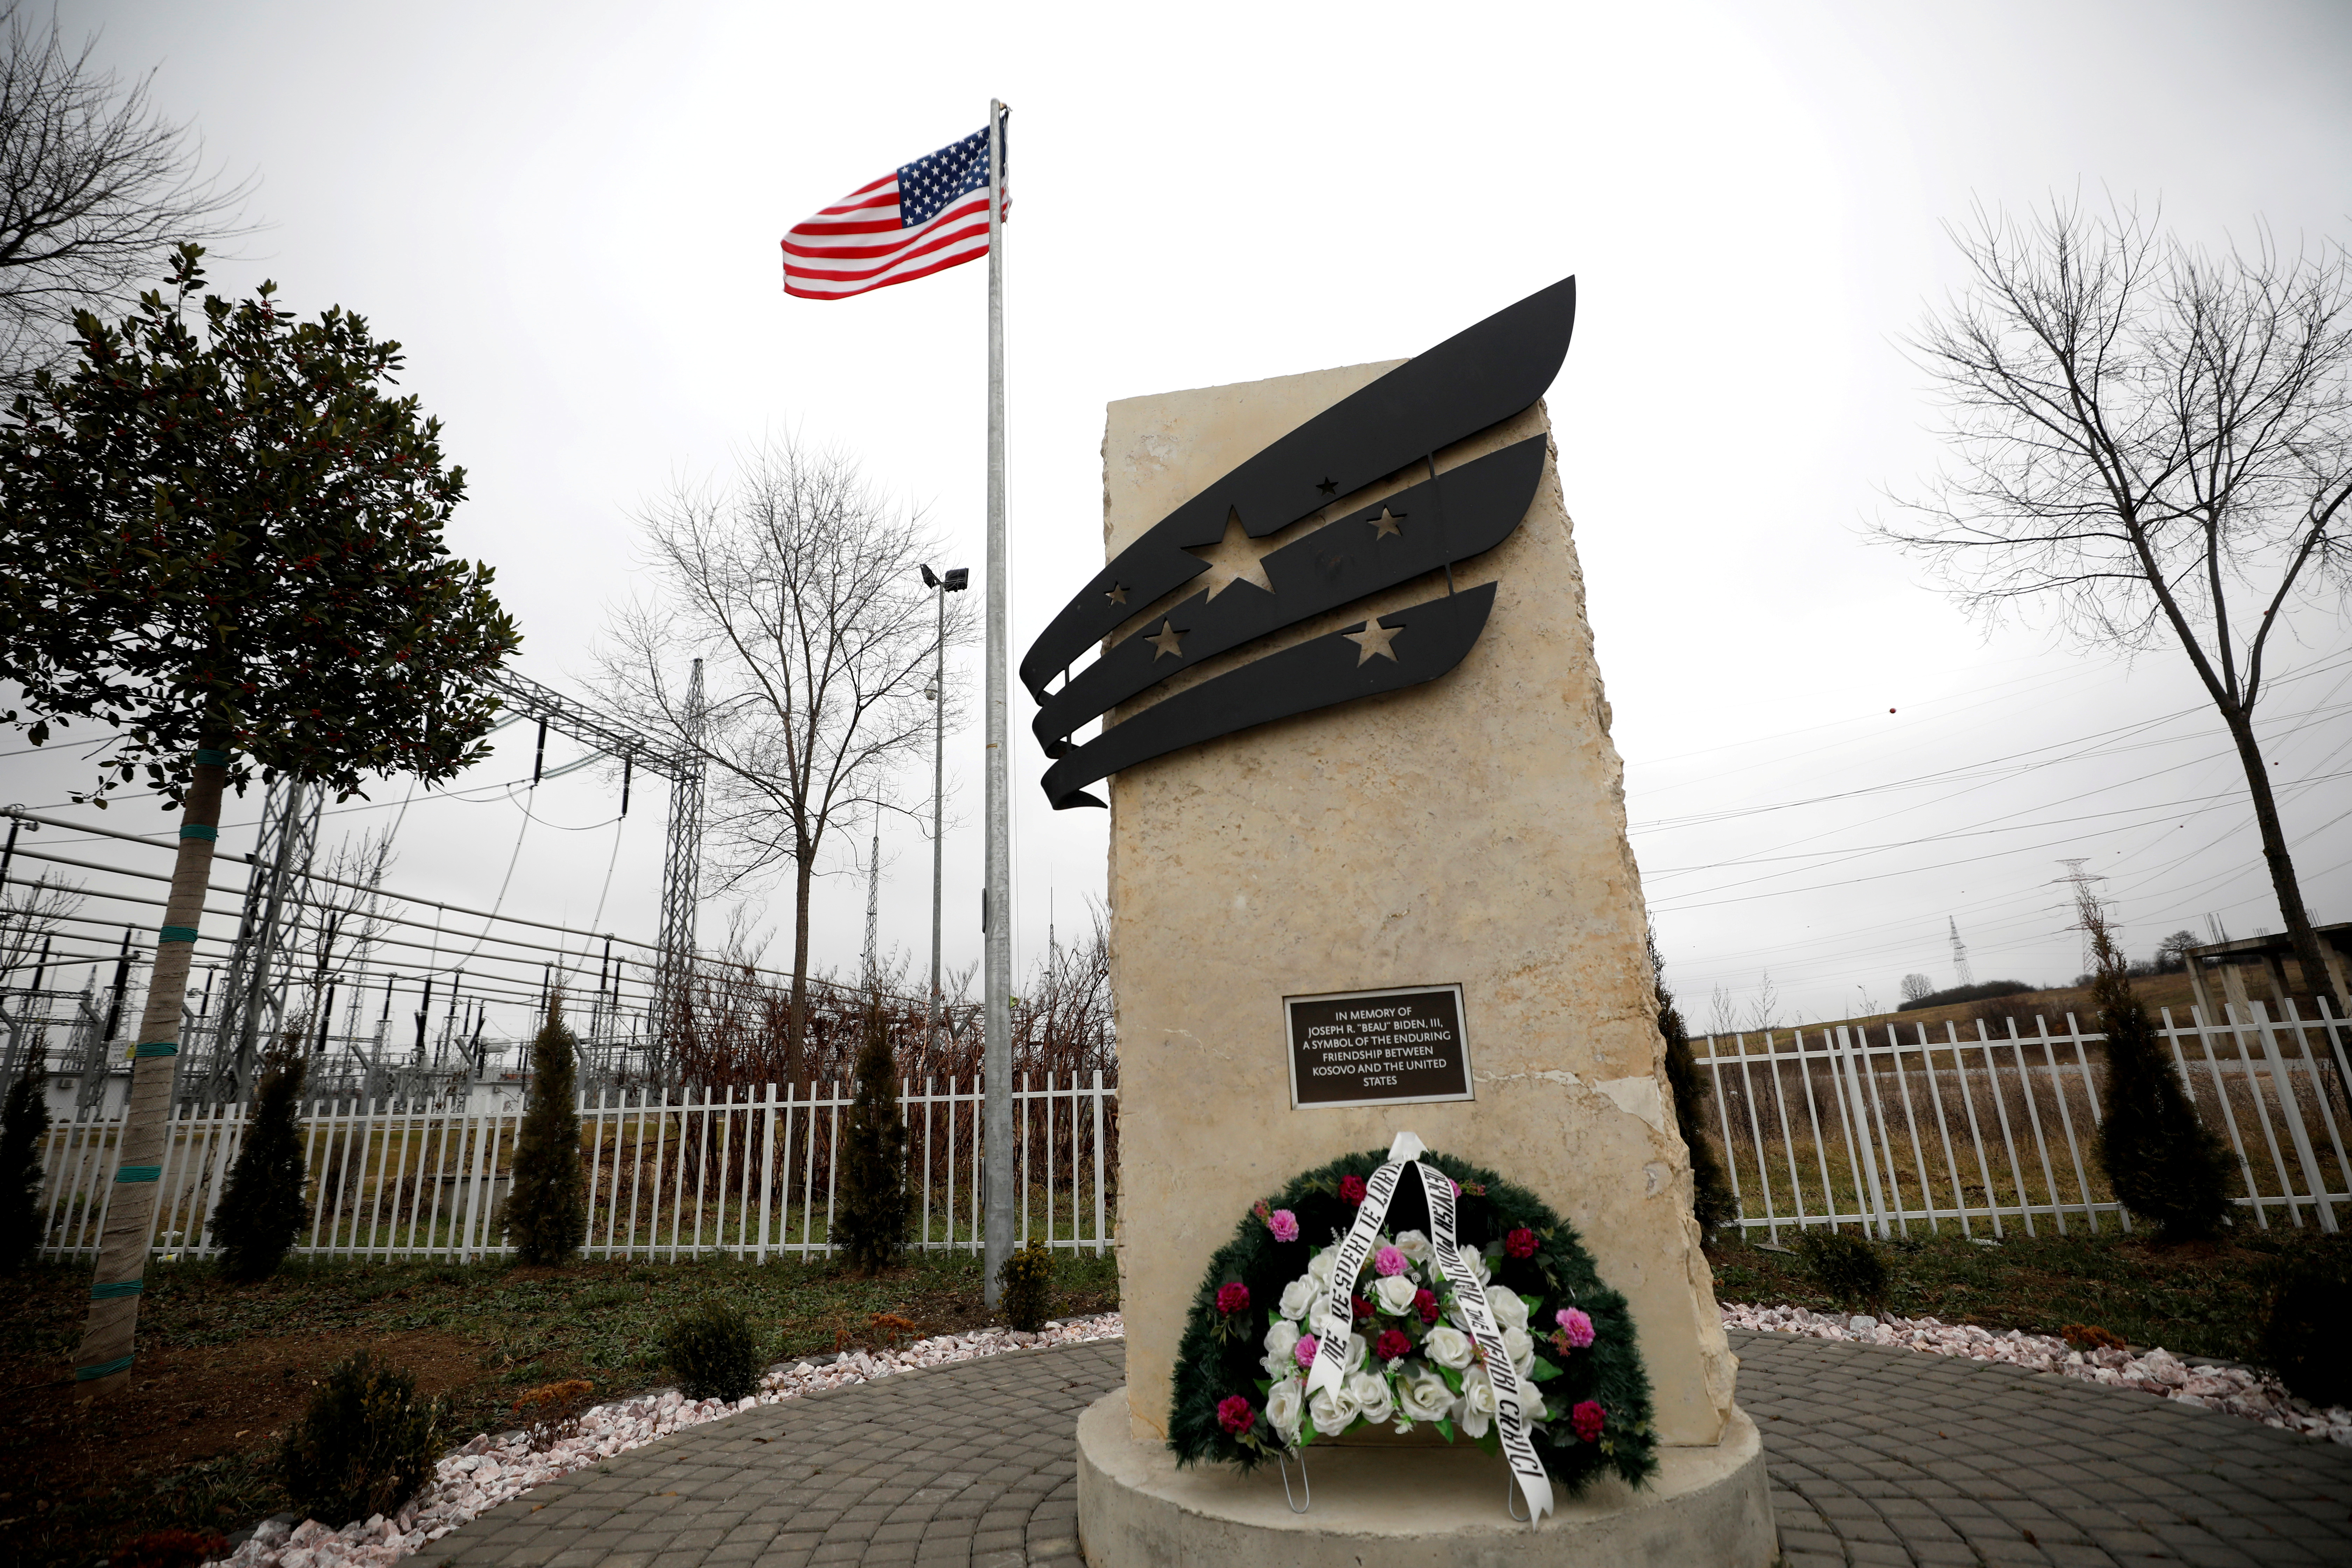 The Memorial of U.S. President-elect Joe Biden's late son, Joseph R. 'Beau' Biden, III, is pictured in the village of Sojevo, Kosovo, December 20, 2020. REUTERS/Florion Goga/File Photo